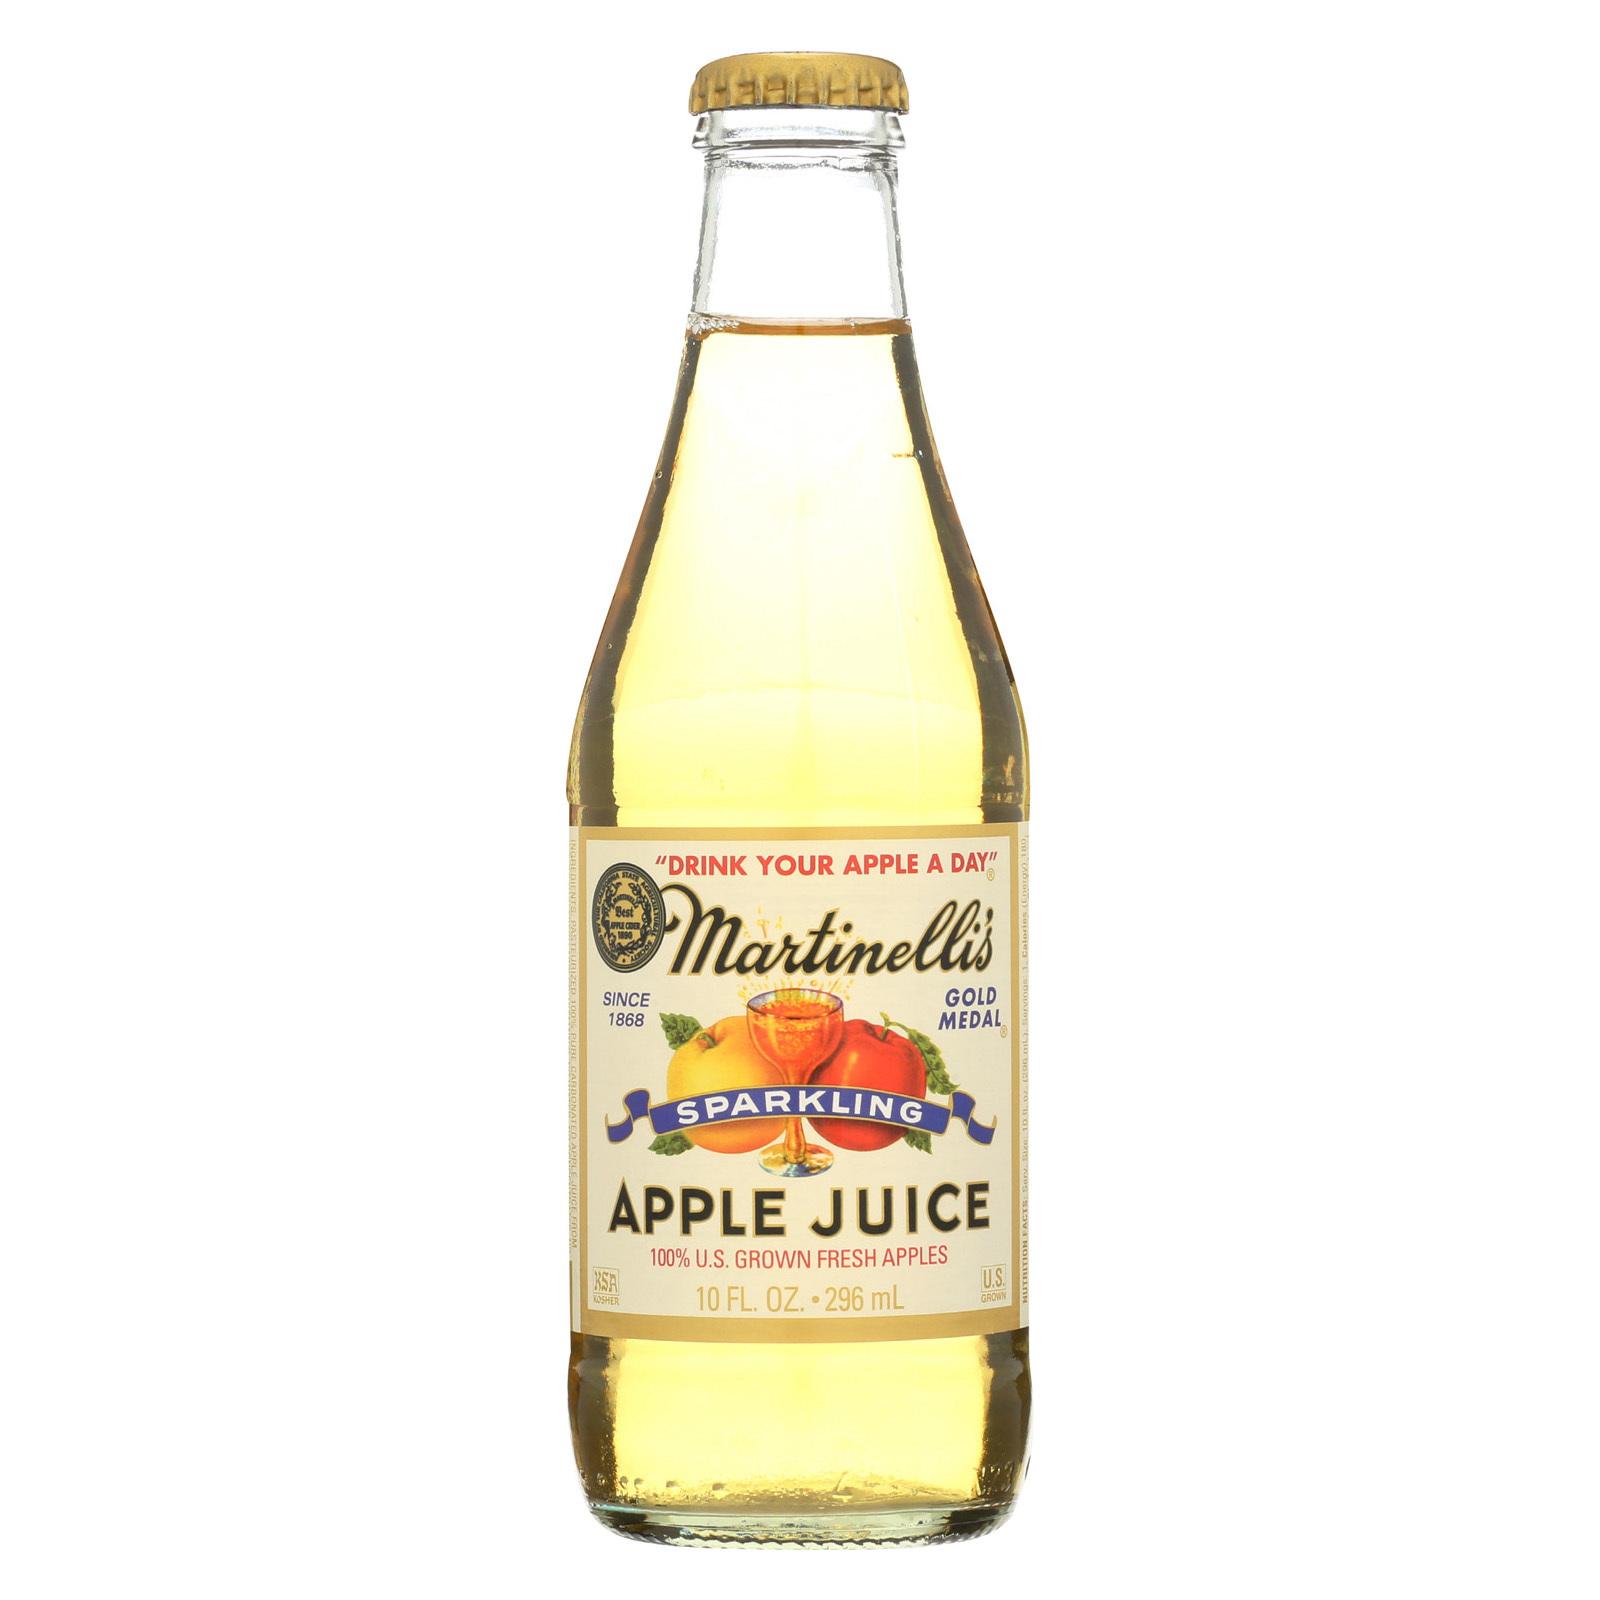 Martinelli's Sparkling Apple Juice - Case of 24 - 10 fl oz